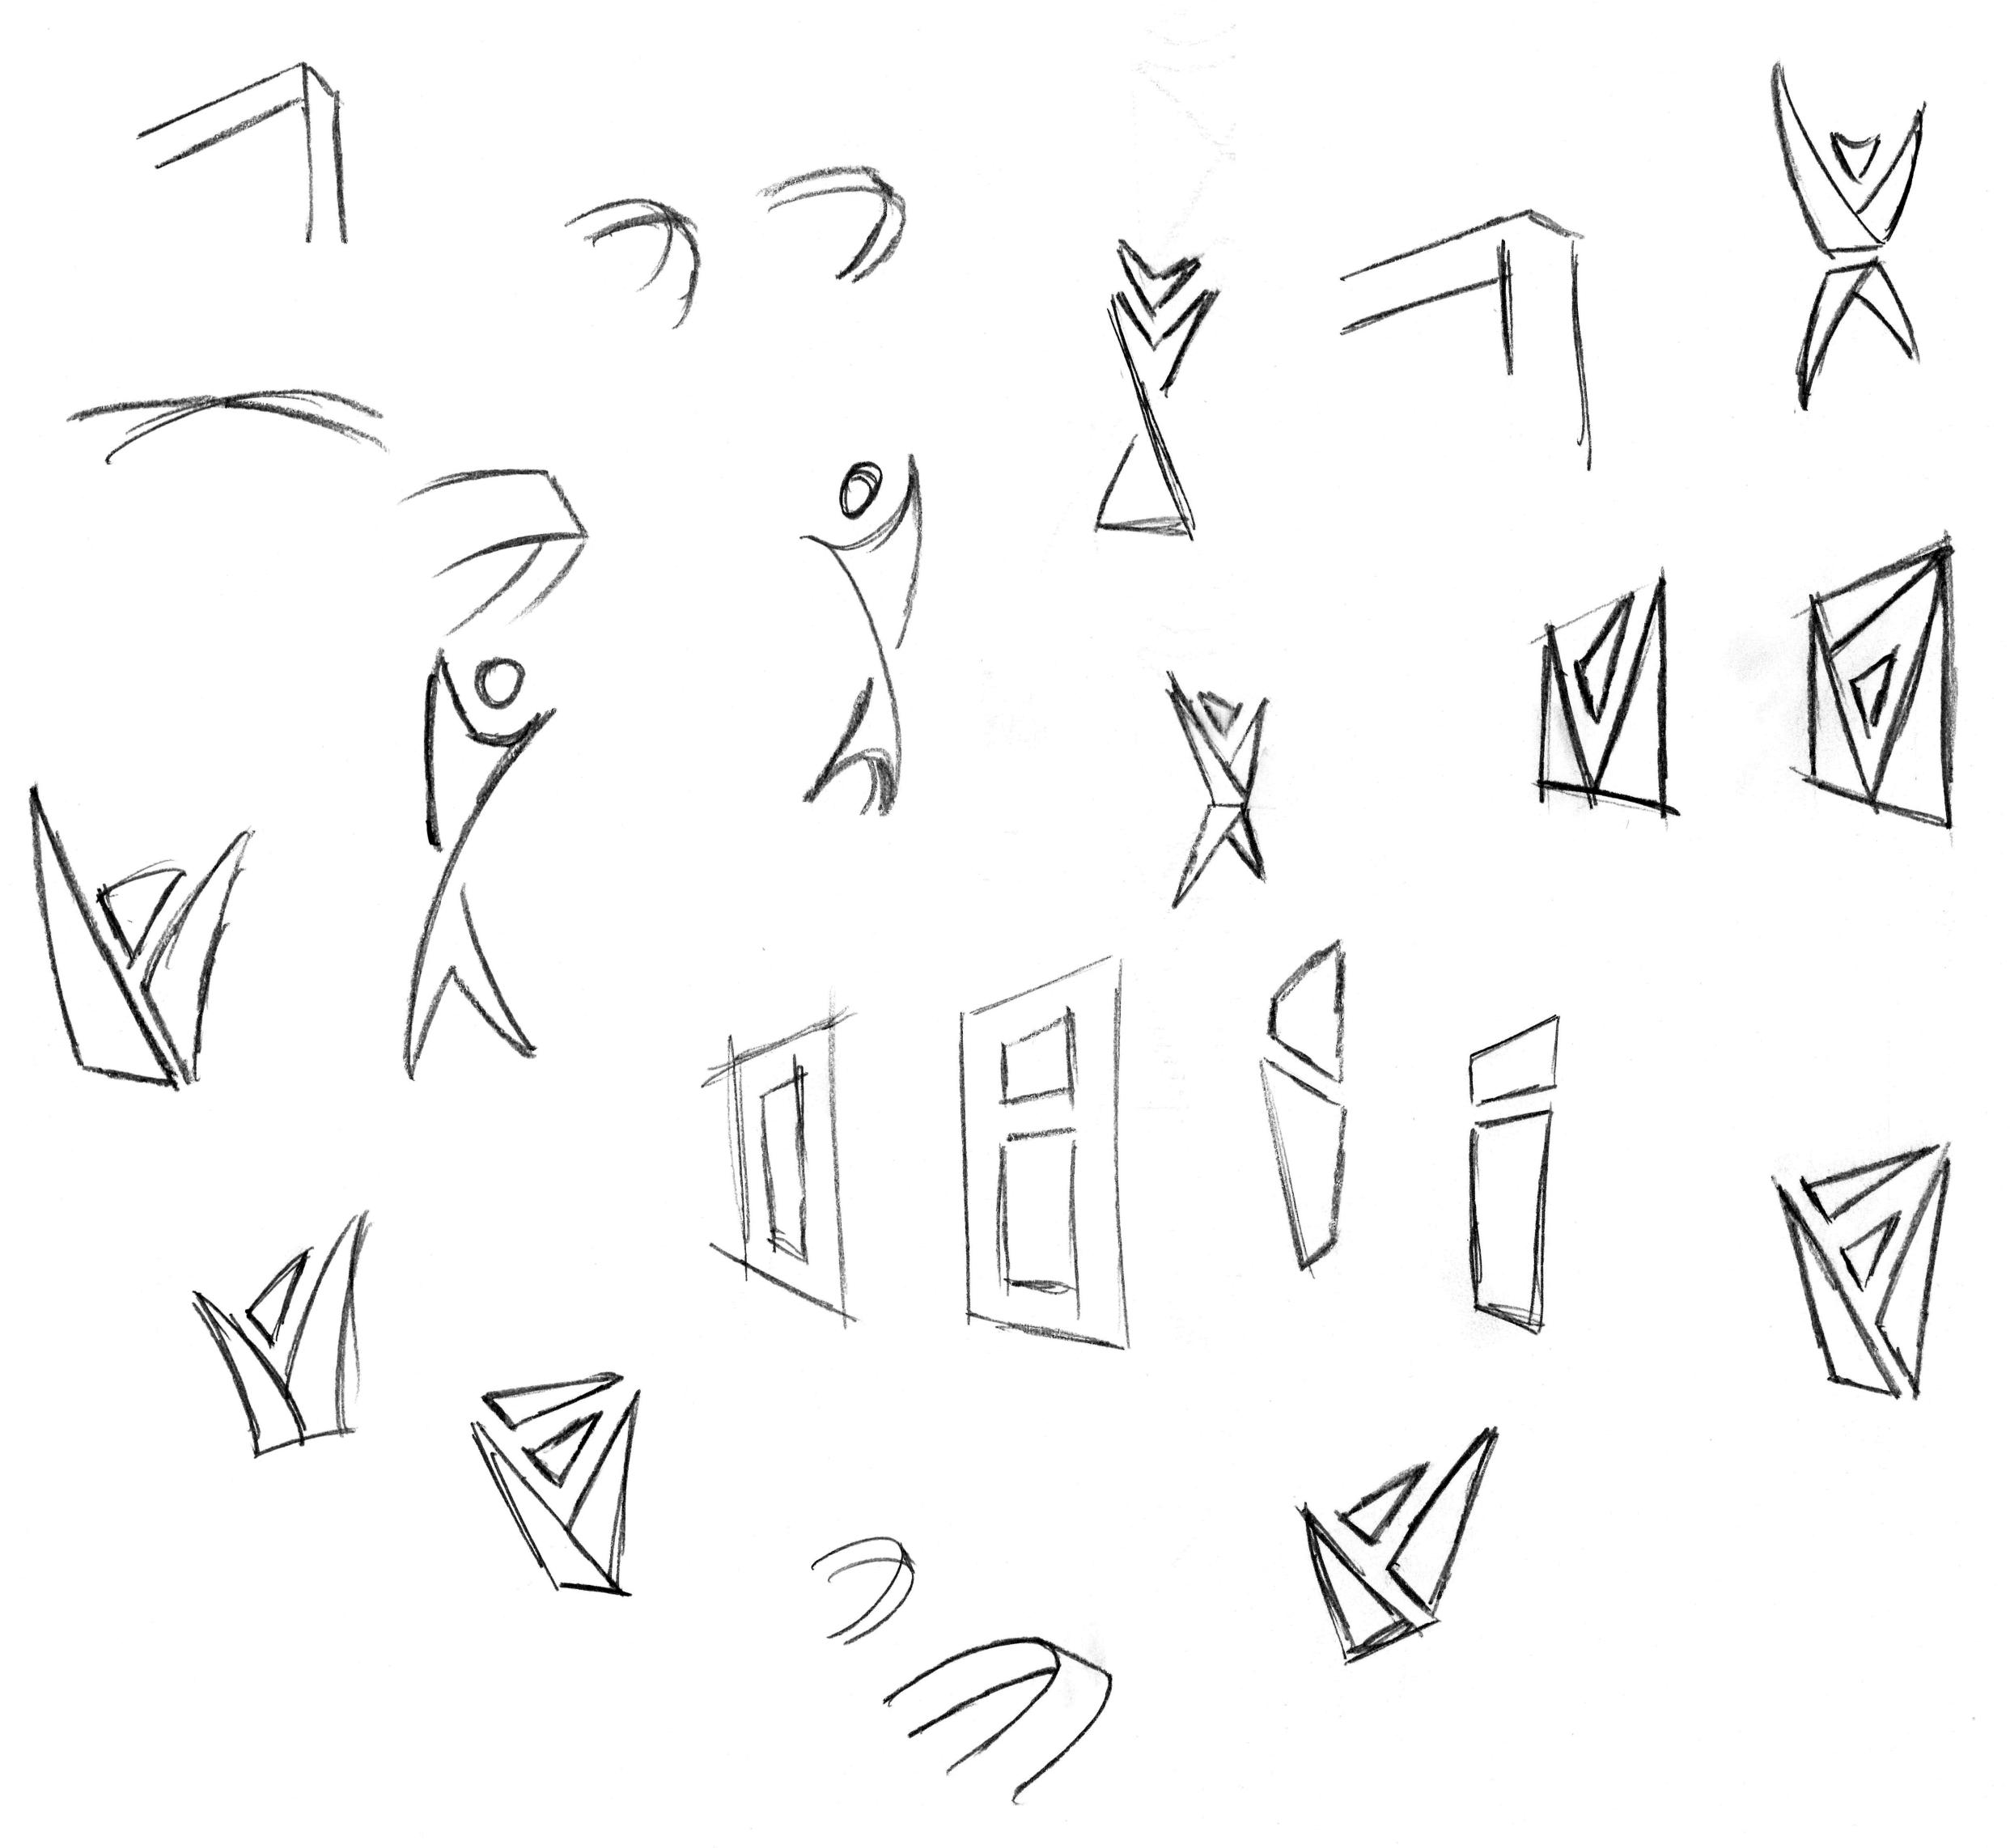 IC_sketch2.png